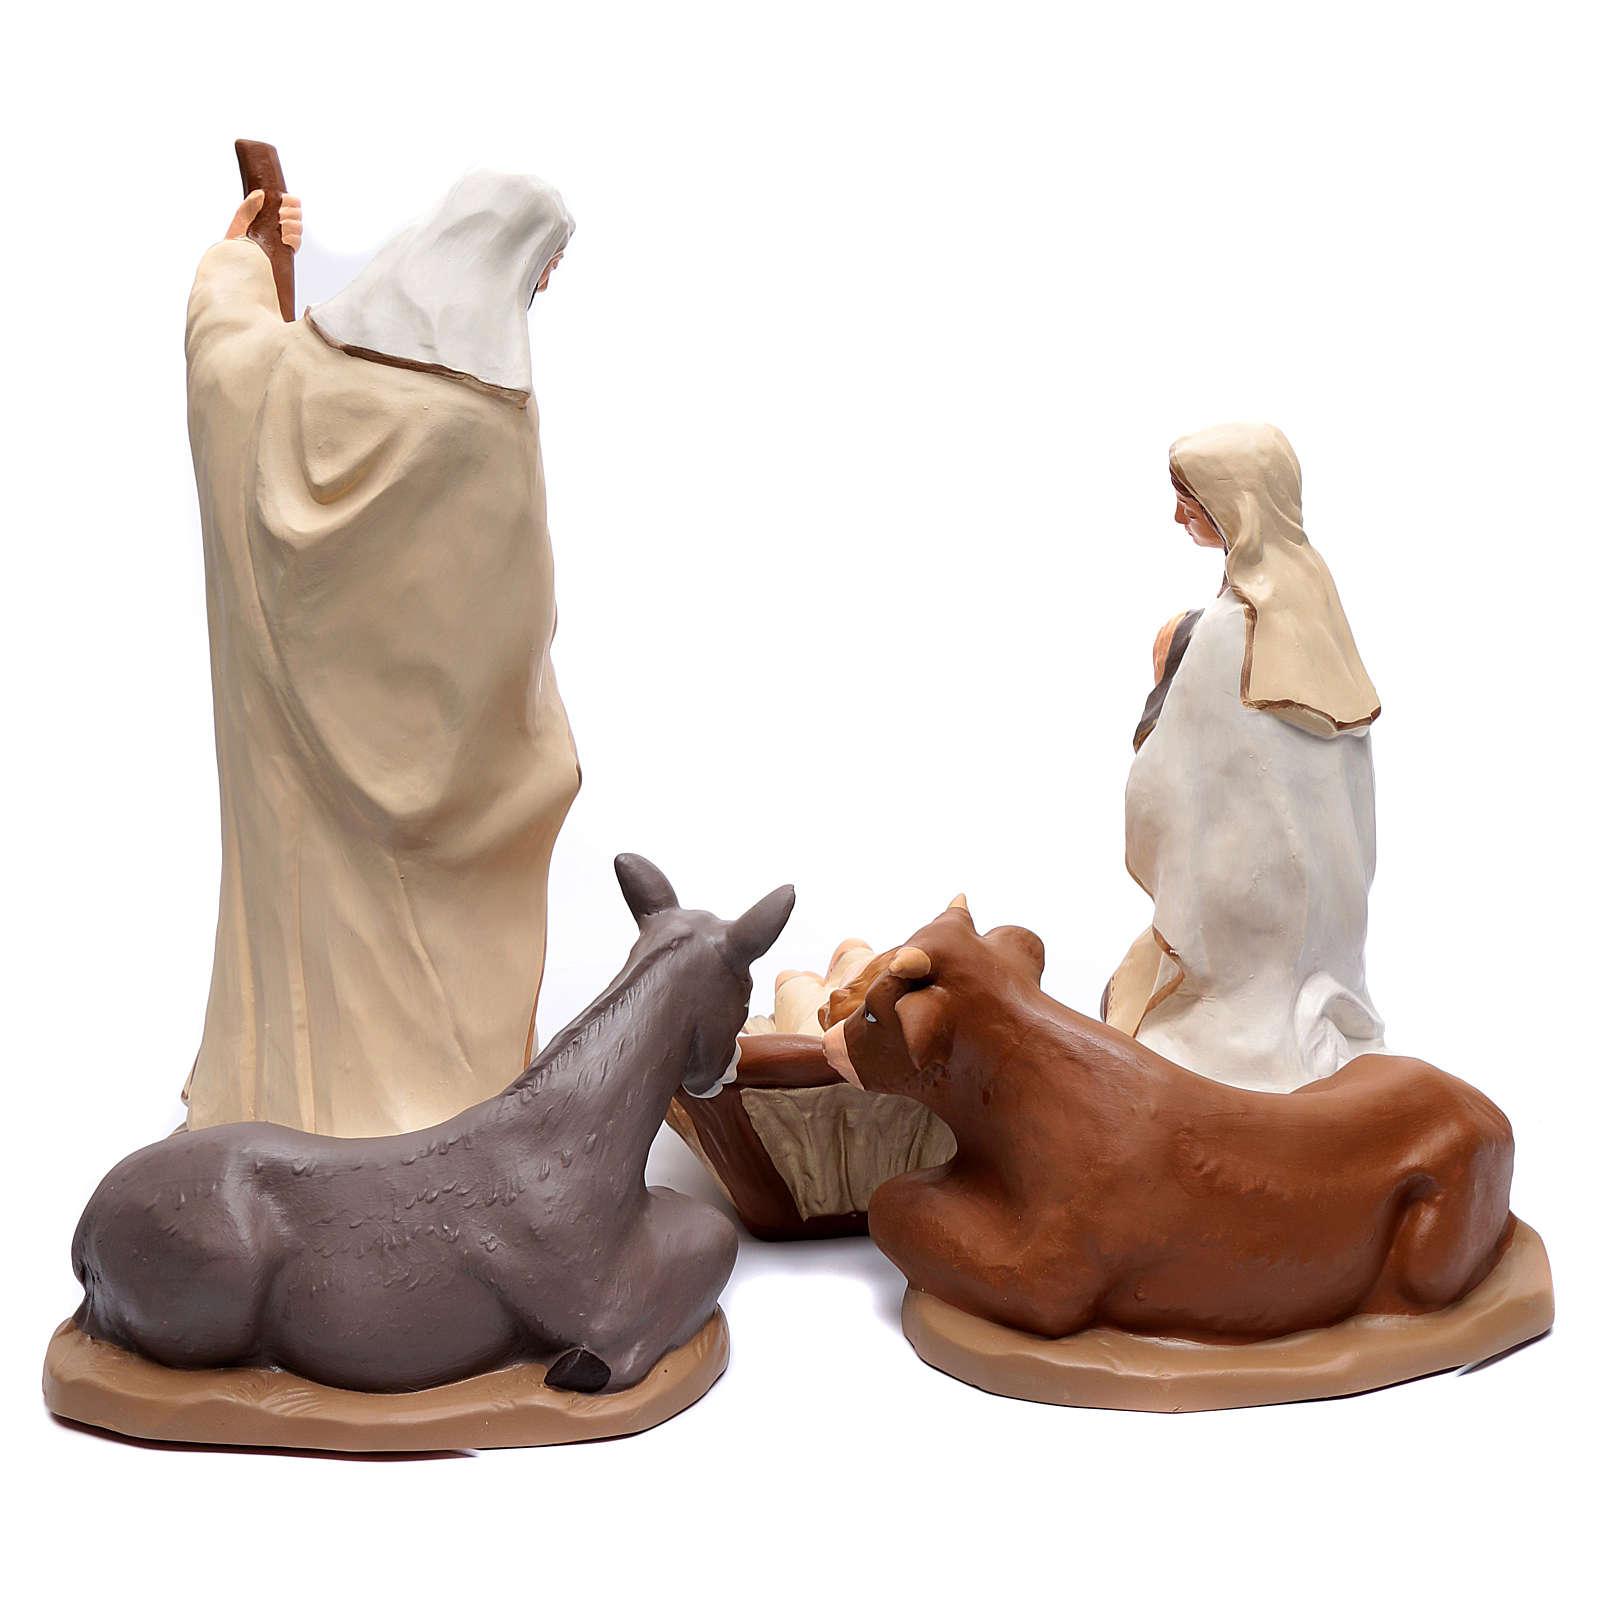 Presepe decoro elegante terracotta Deruta 5 statue 50 cm 4